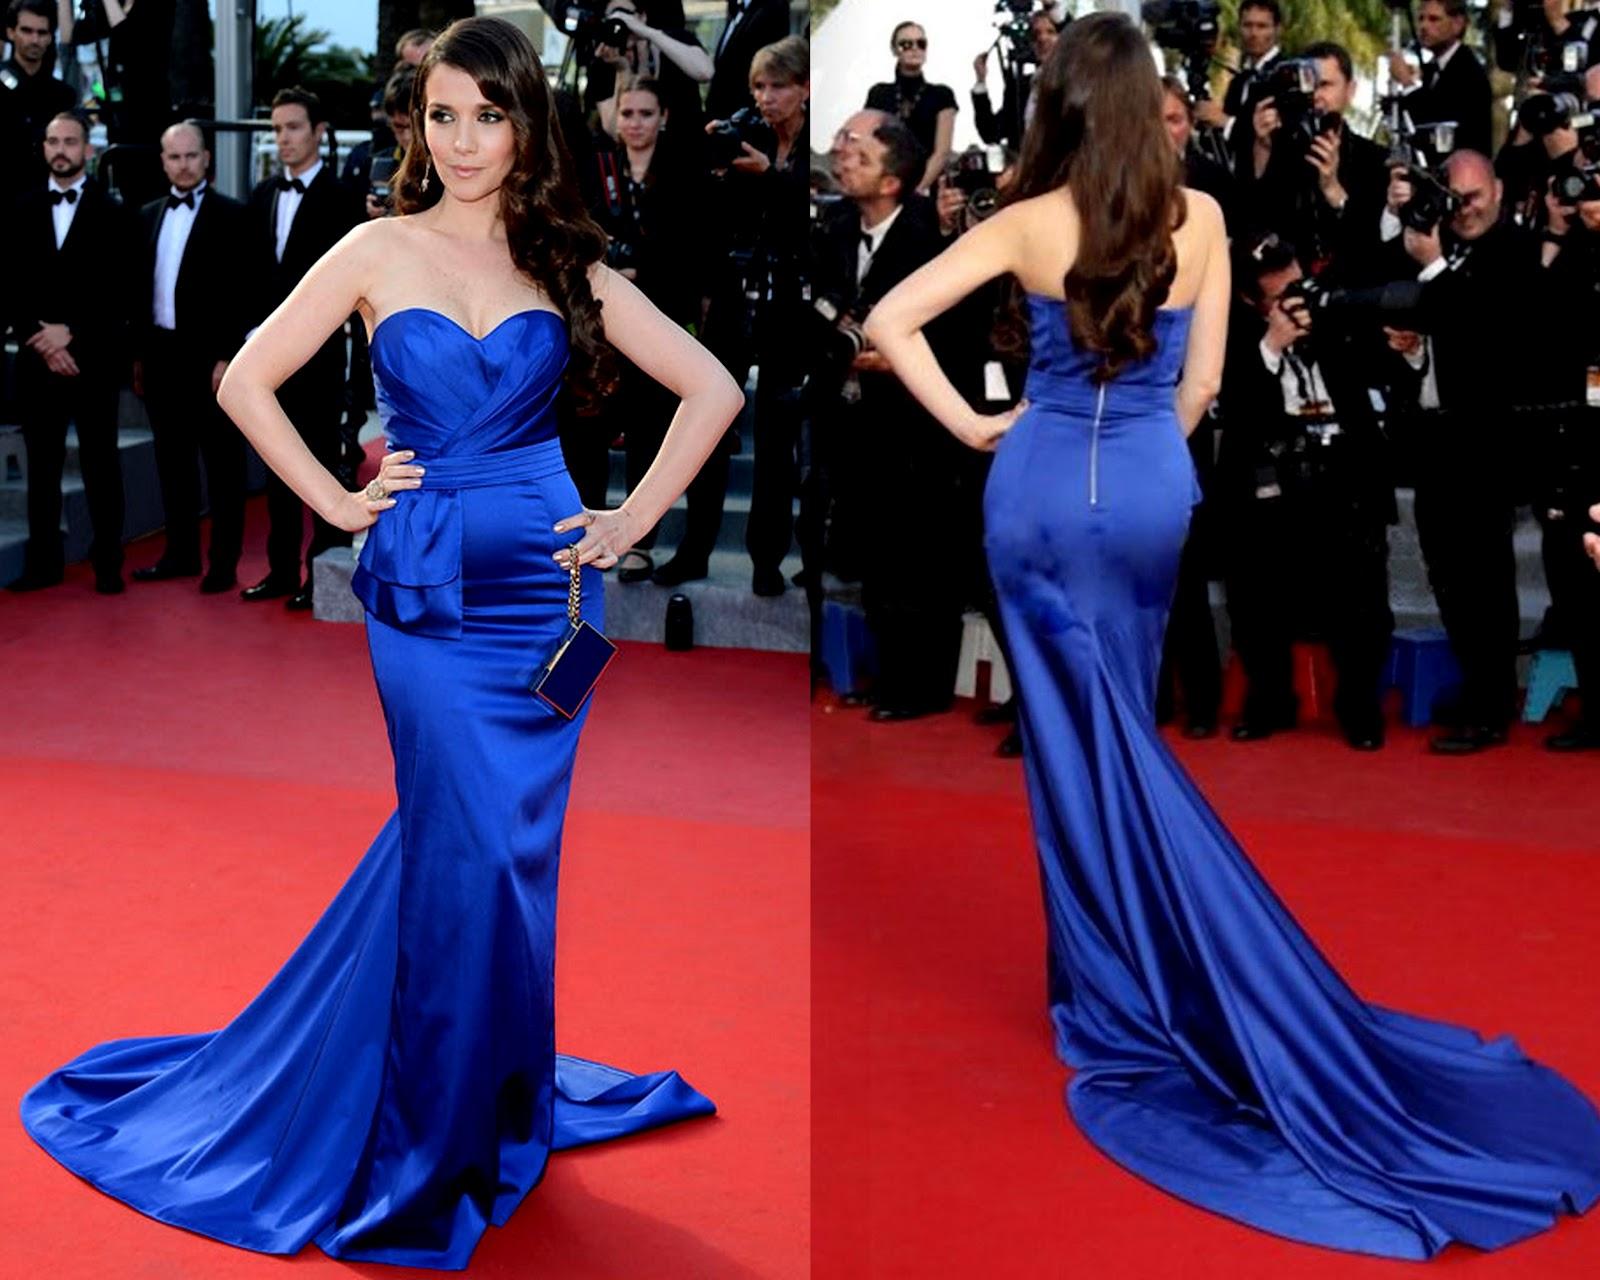 http://4.bp.blogspot.com/-WK976n1MmE4/T76ZlUzXpMI/AAAAAAAAA9k/tmEajzQLjoA/s1600/Natalia+Oreiro+Cannes+2012+Vestido+Azul.jpg